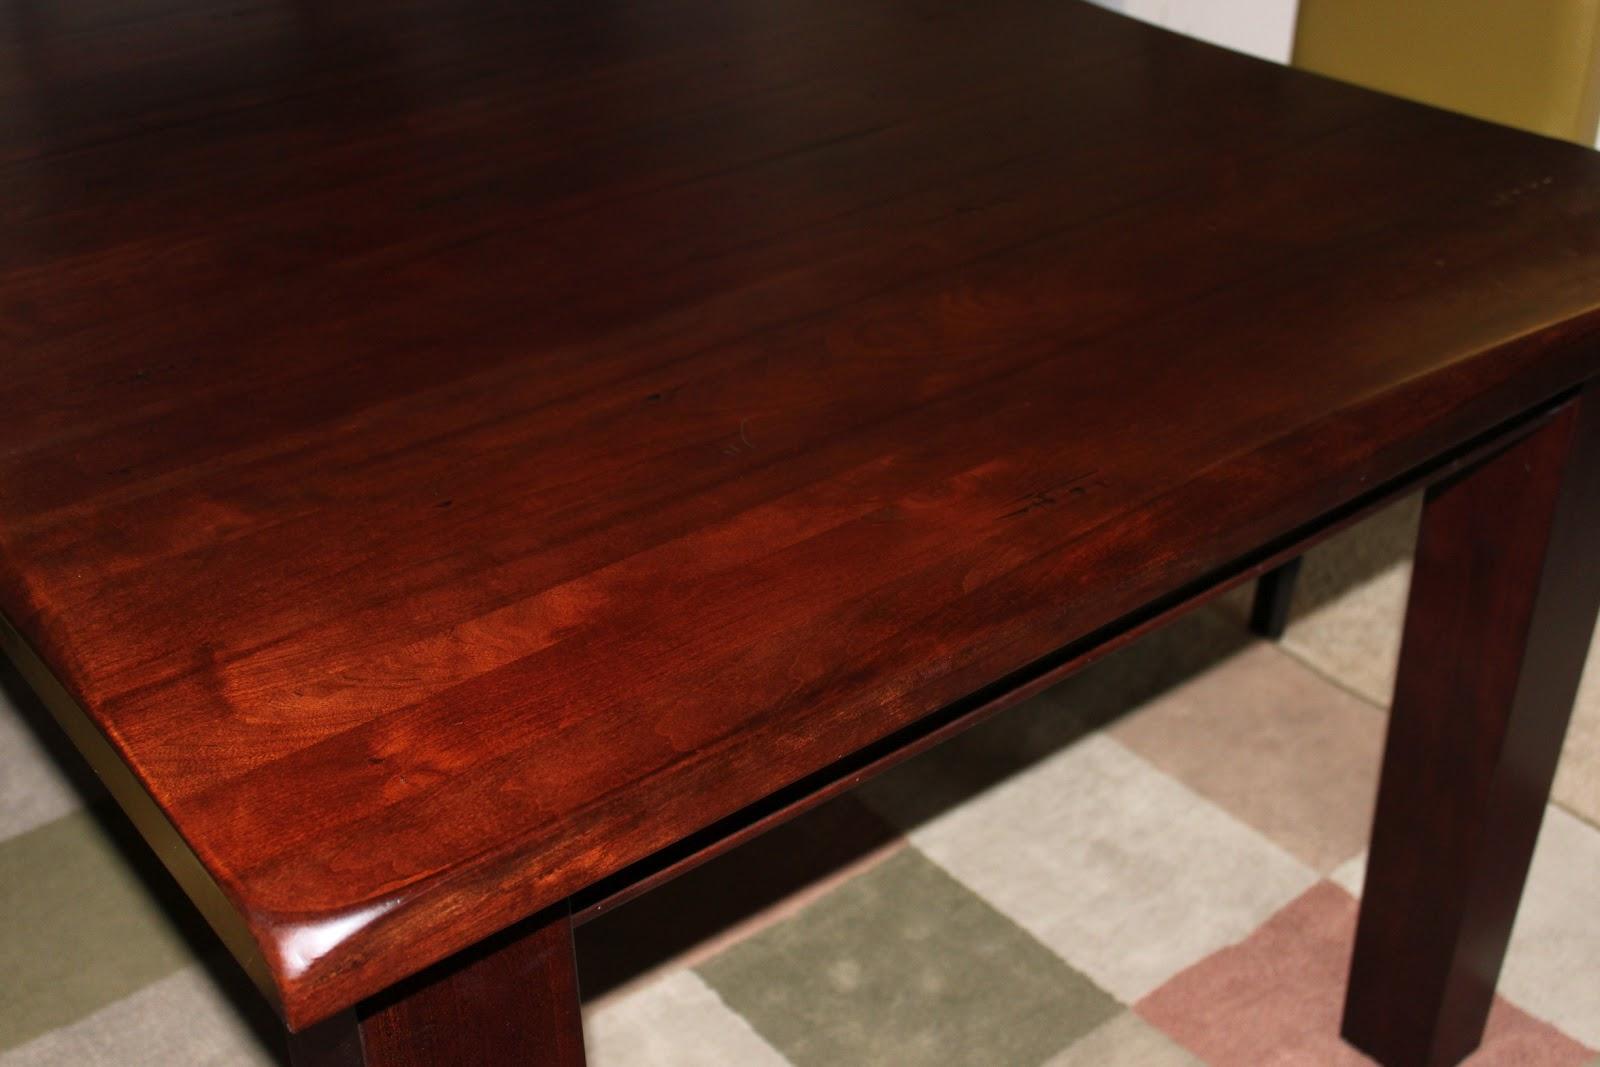 Can I Use Car Wax On Wood Table